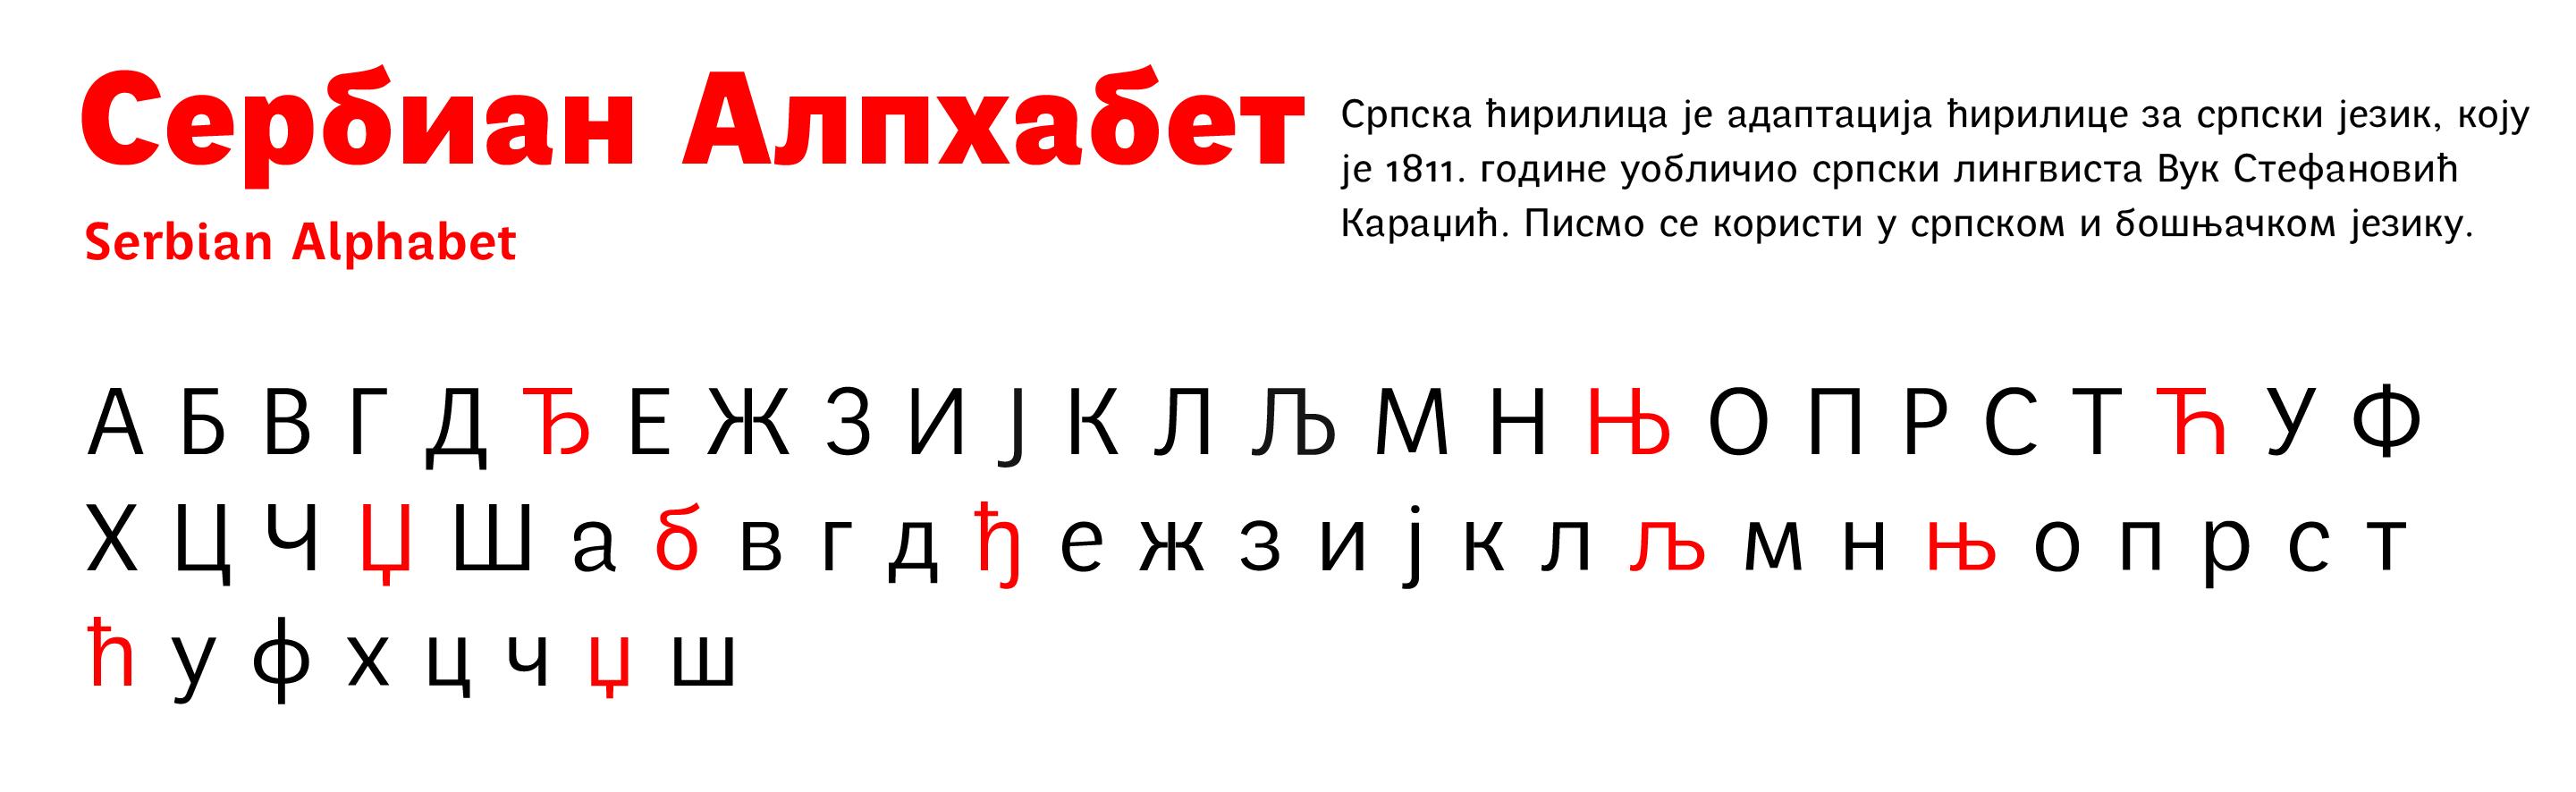 perece_cyrillic_specimen2_RED1-04